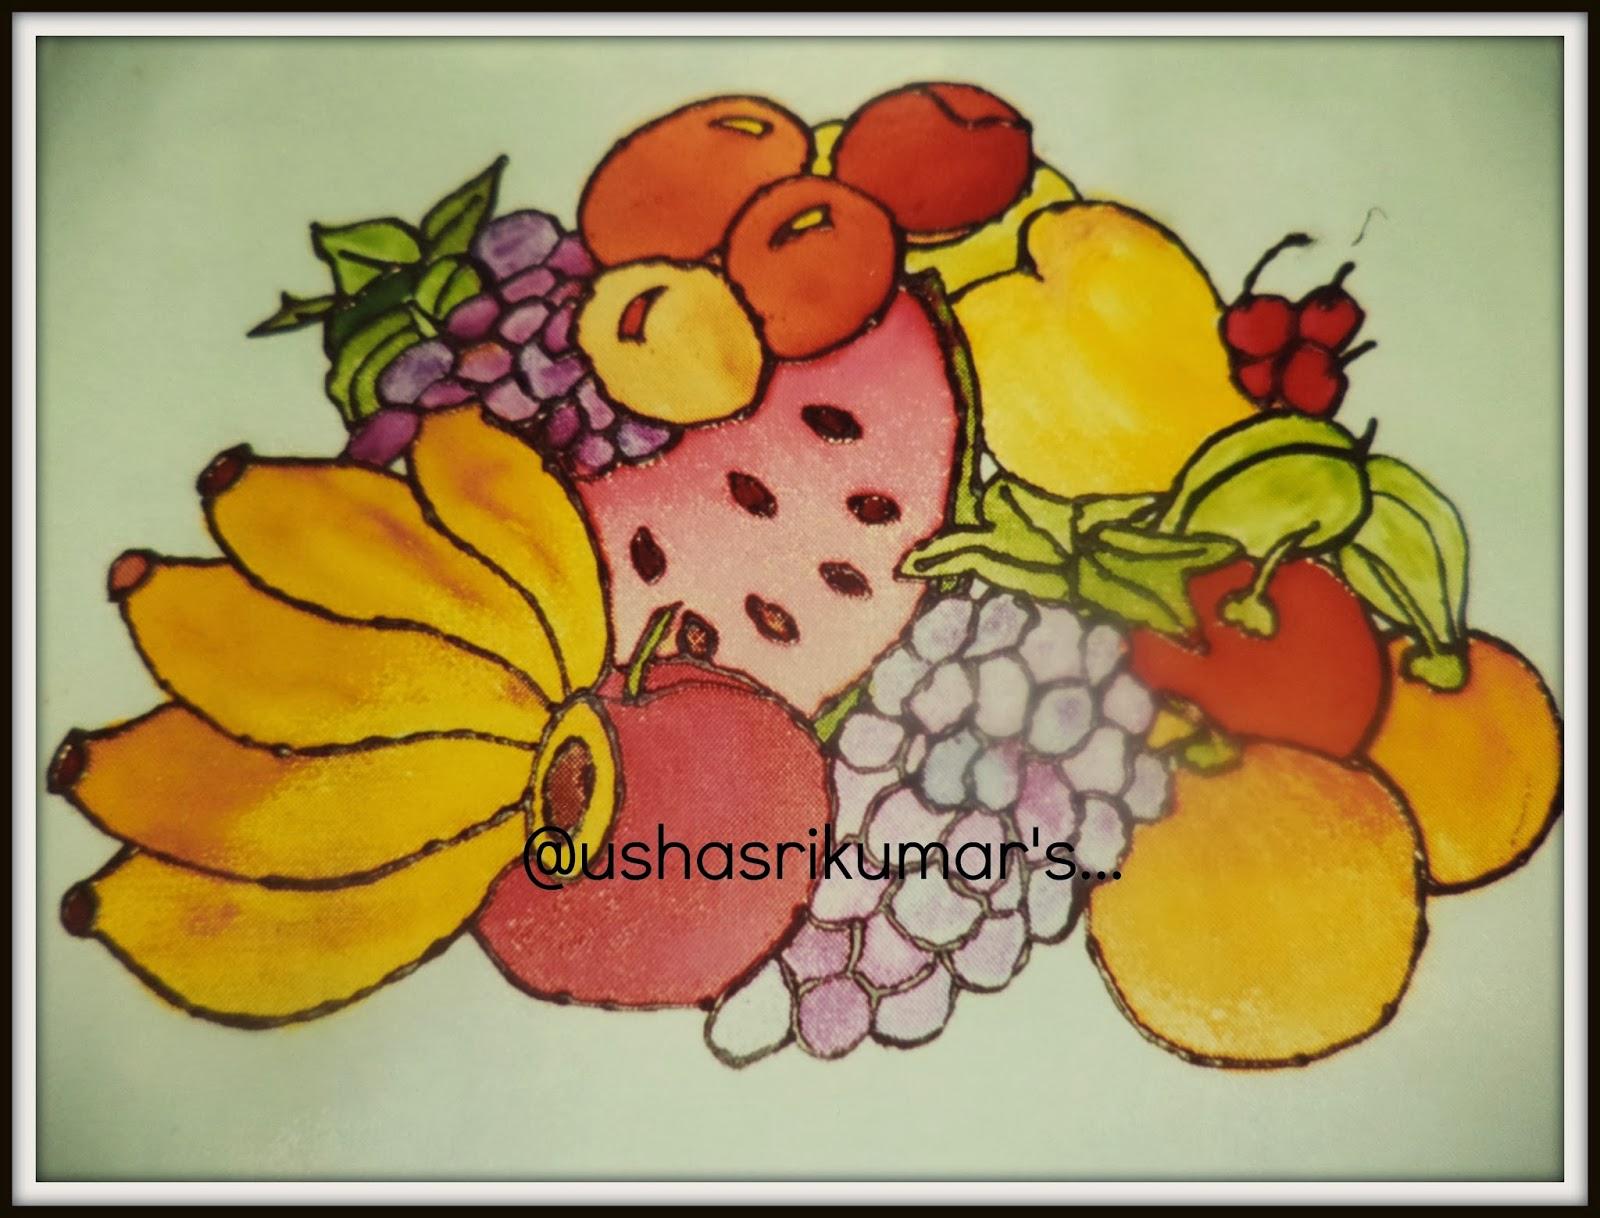 USHA SRIKUMARS MUSINGS HEALTHY N TASTY FRUITS